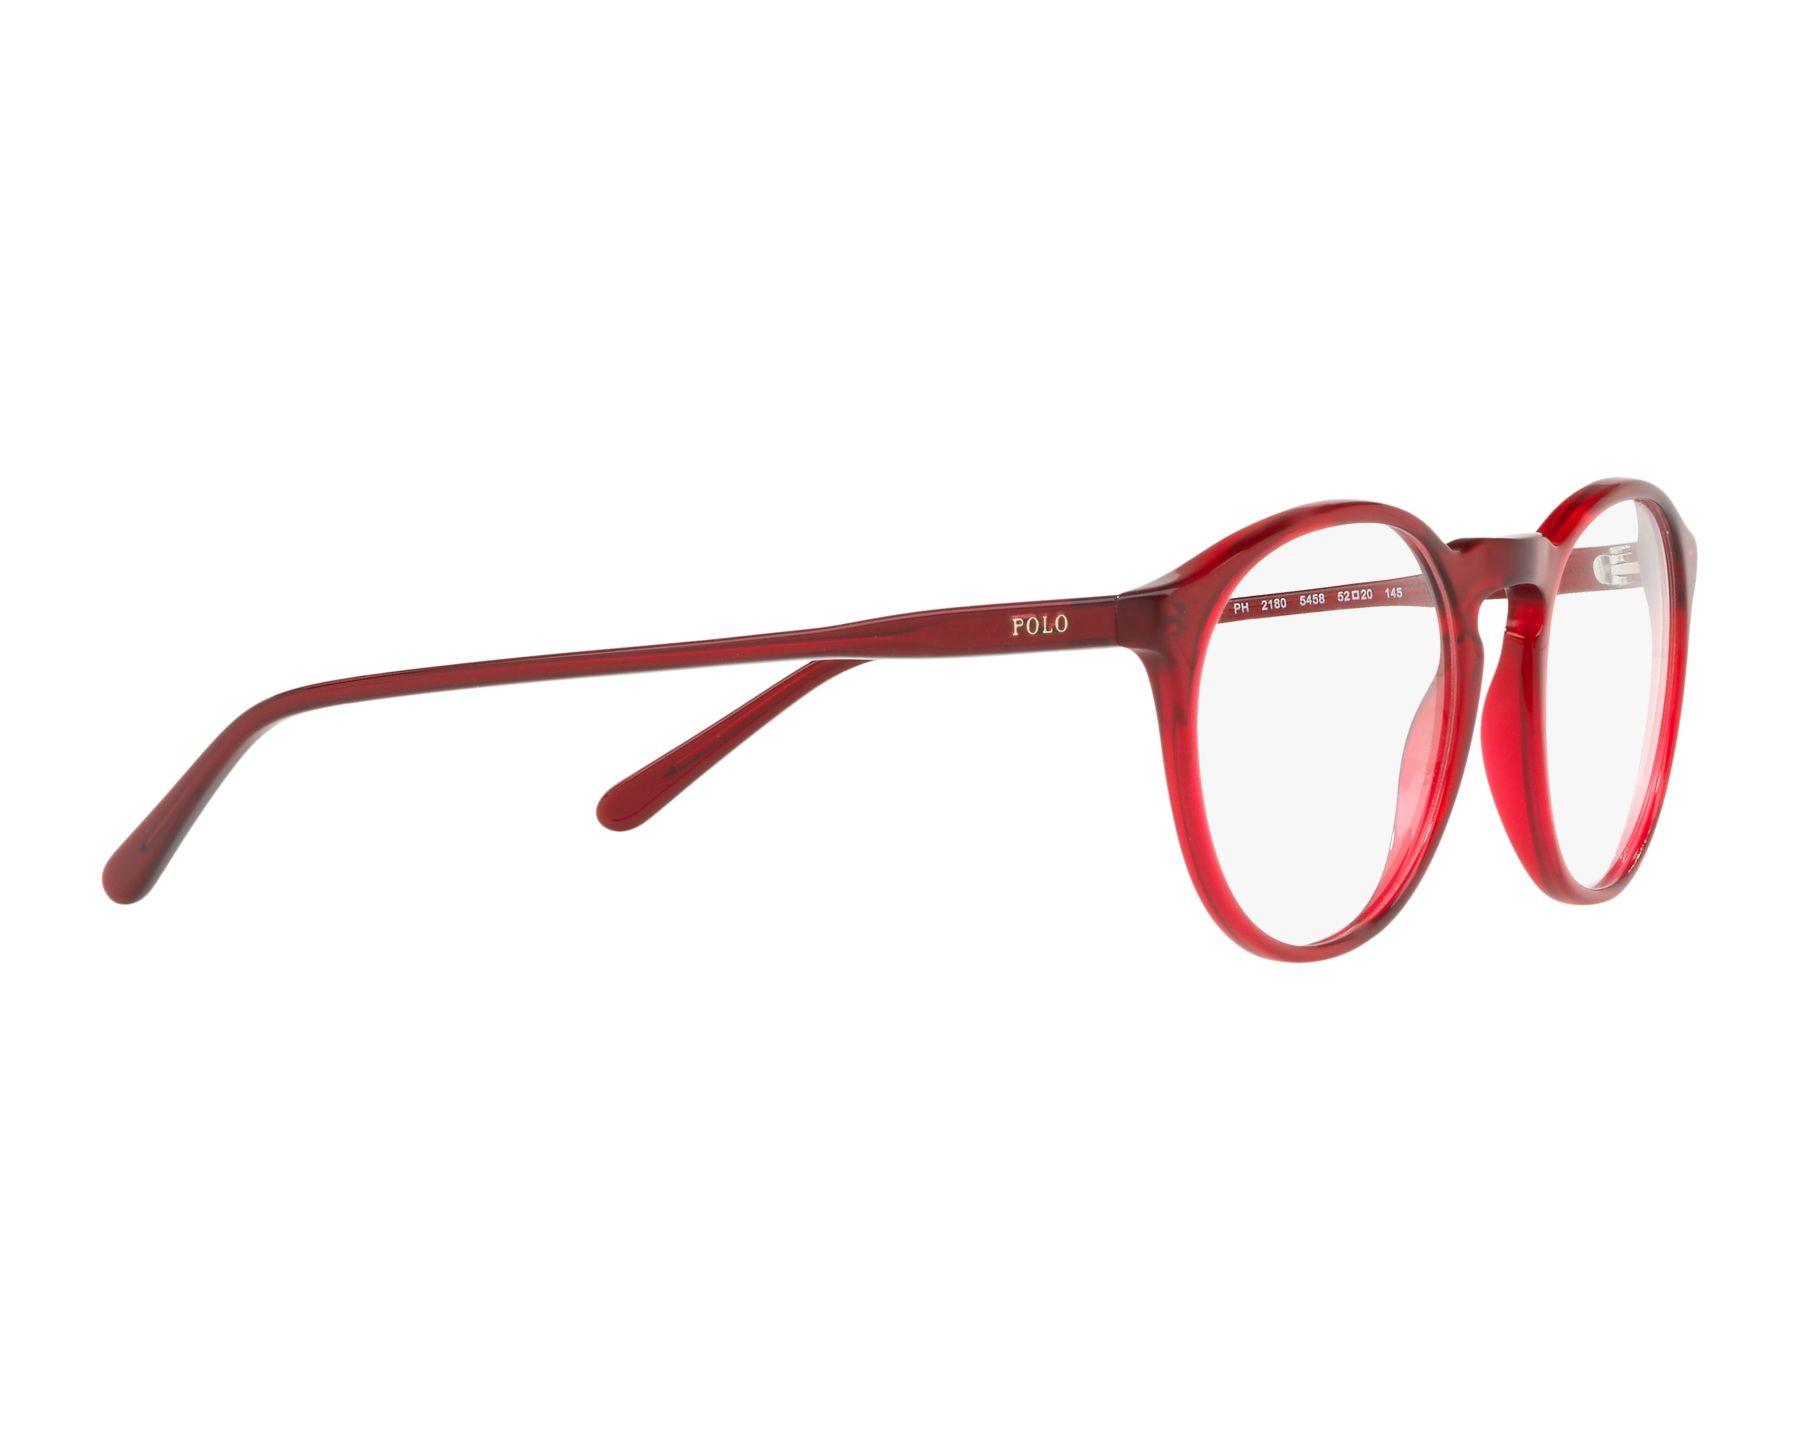 08d9ddc6b8 eyeglasses Polo Ralph Lauren PH-2180 5458 50-20 Red 360 degree view 11